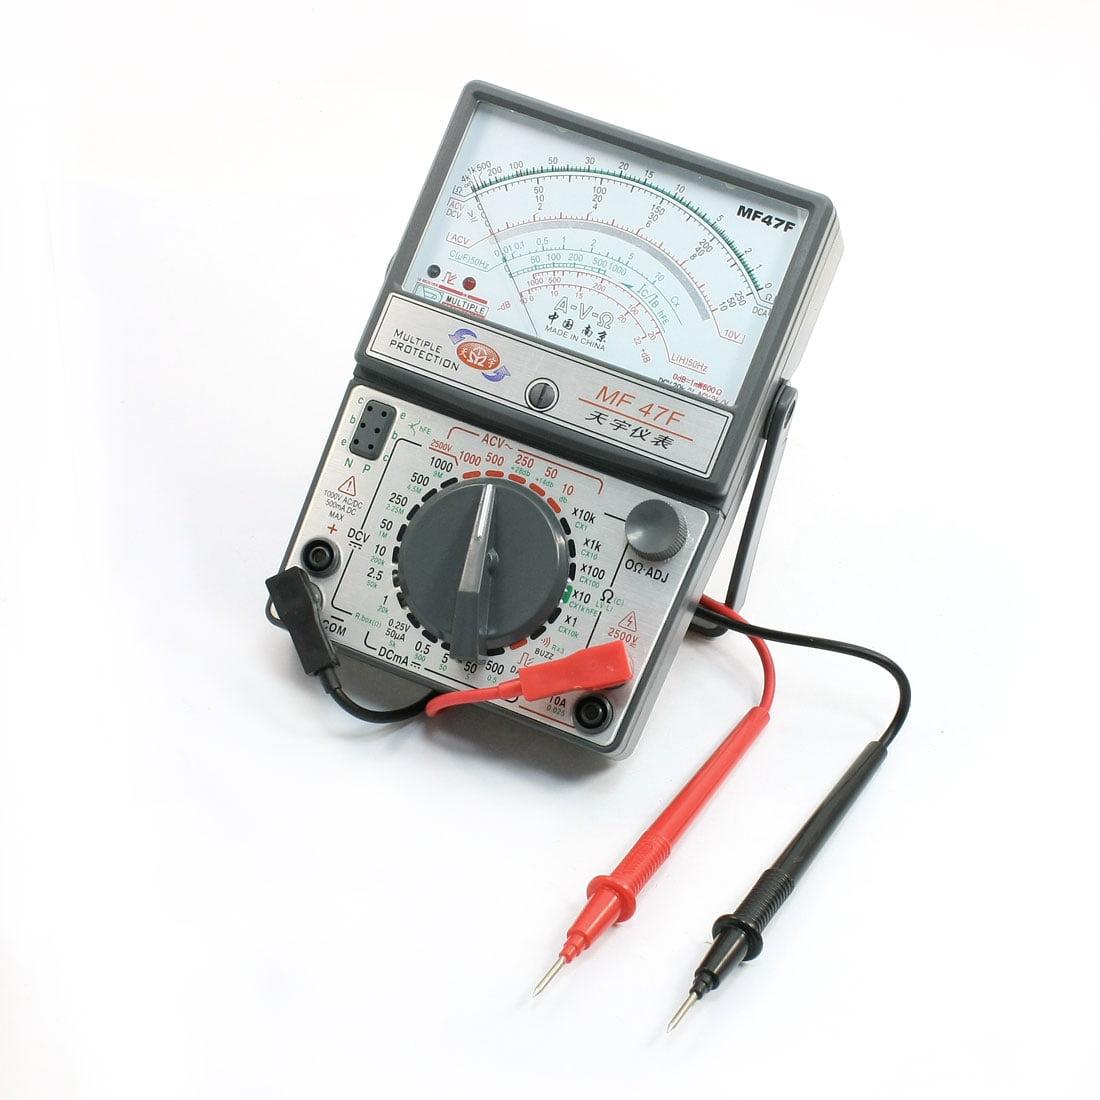 Unique Bargains Ohm AC DC Current Voltage Measuring MF47F Multimeter w Probe Leads